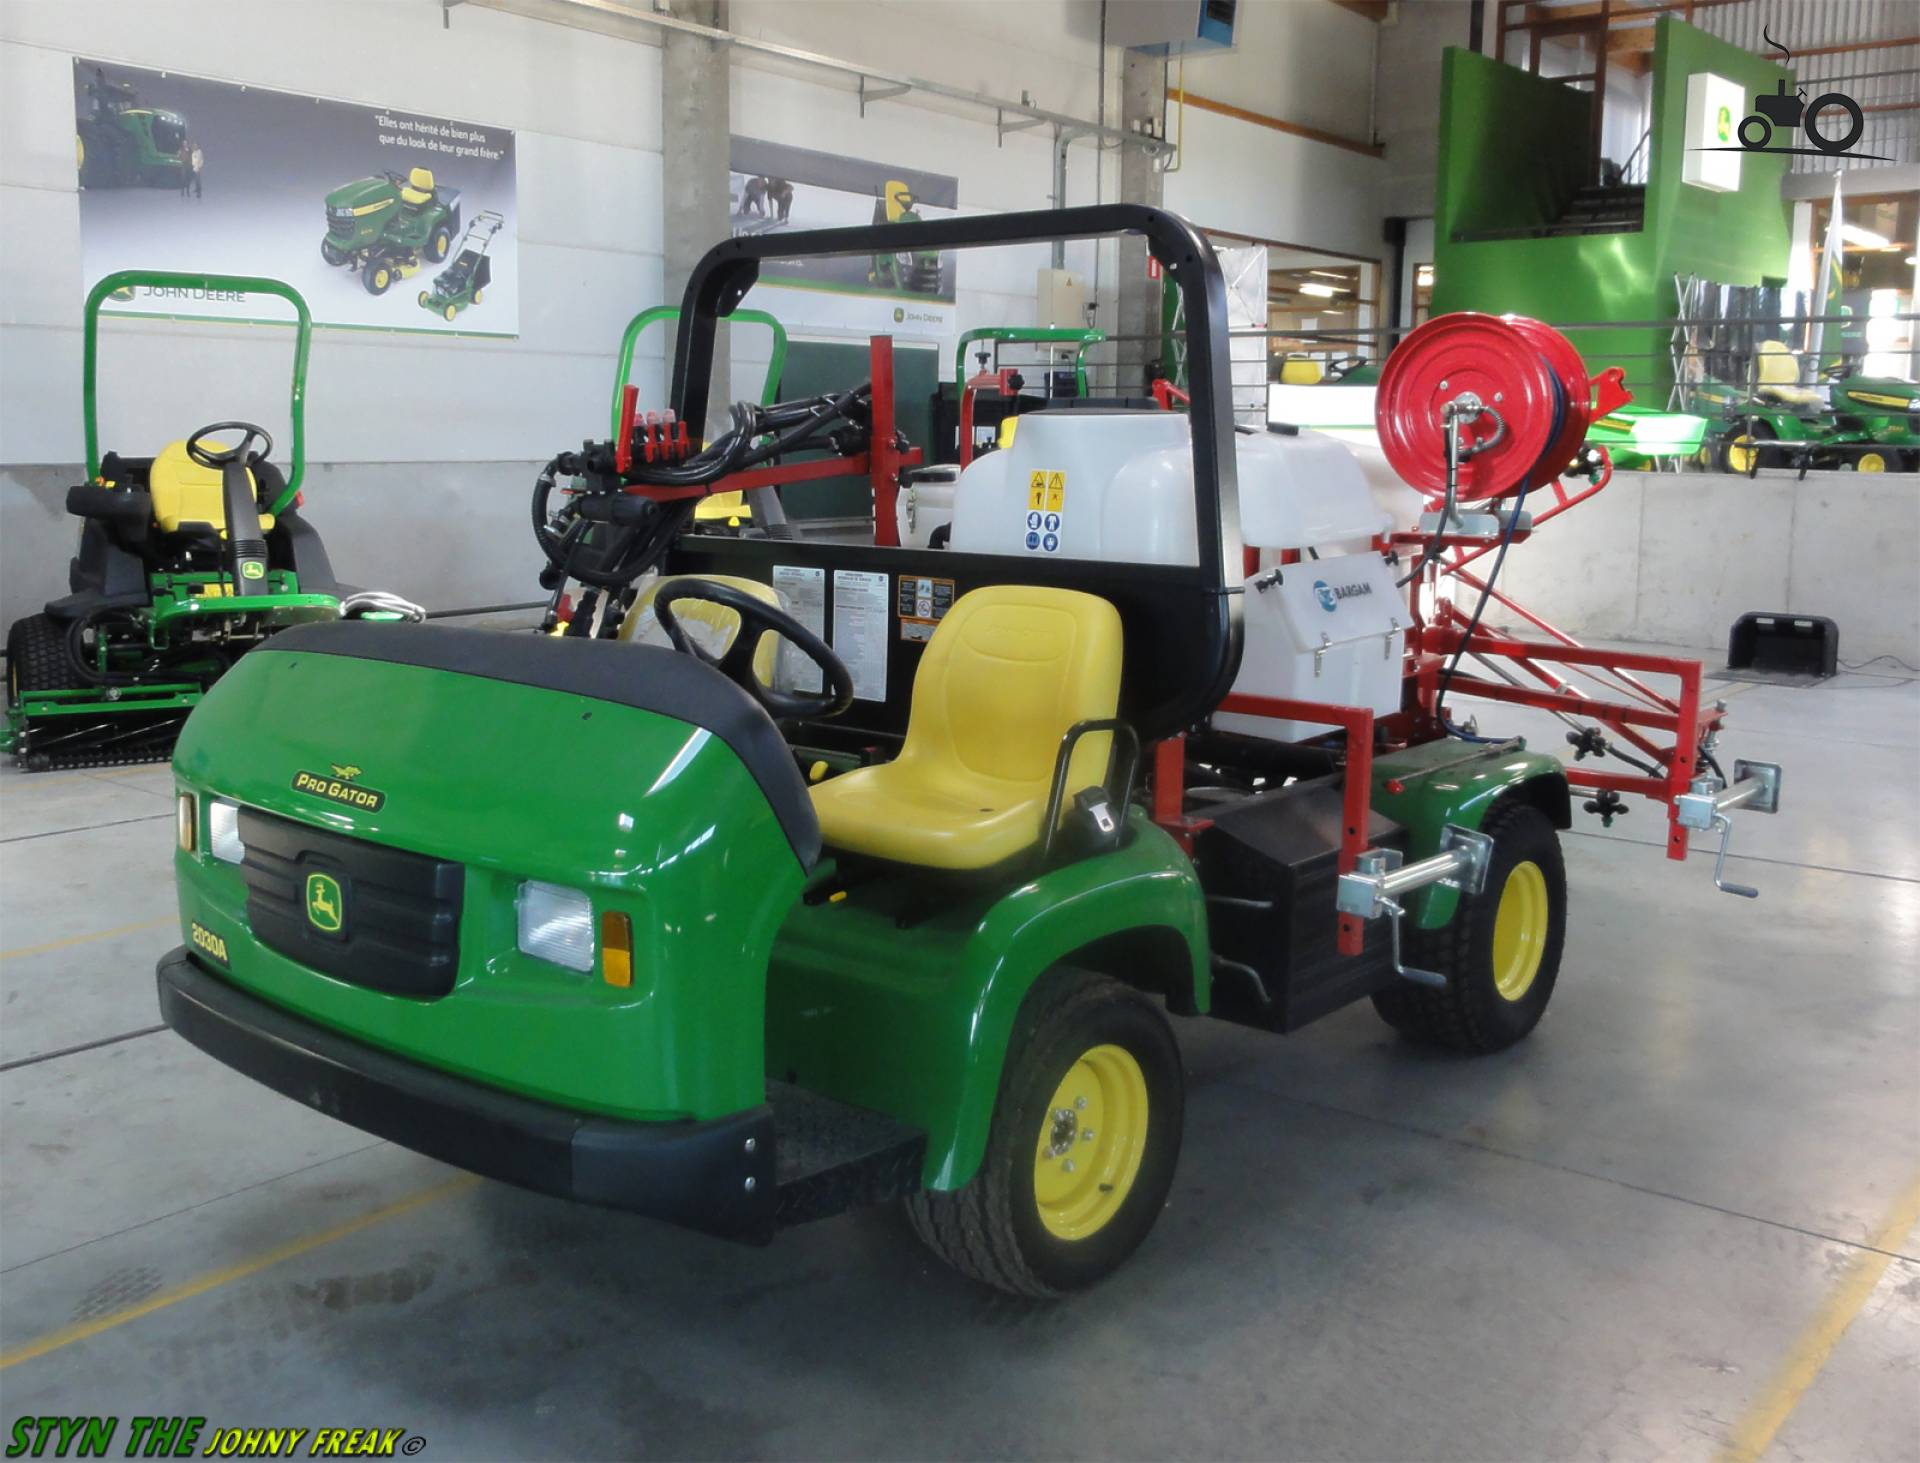 John Deere Super Stock Pulling Tractors : John deere pro stock pulling tractors car interior design